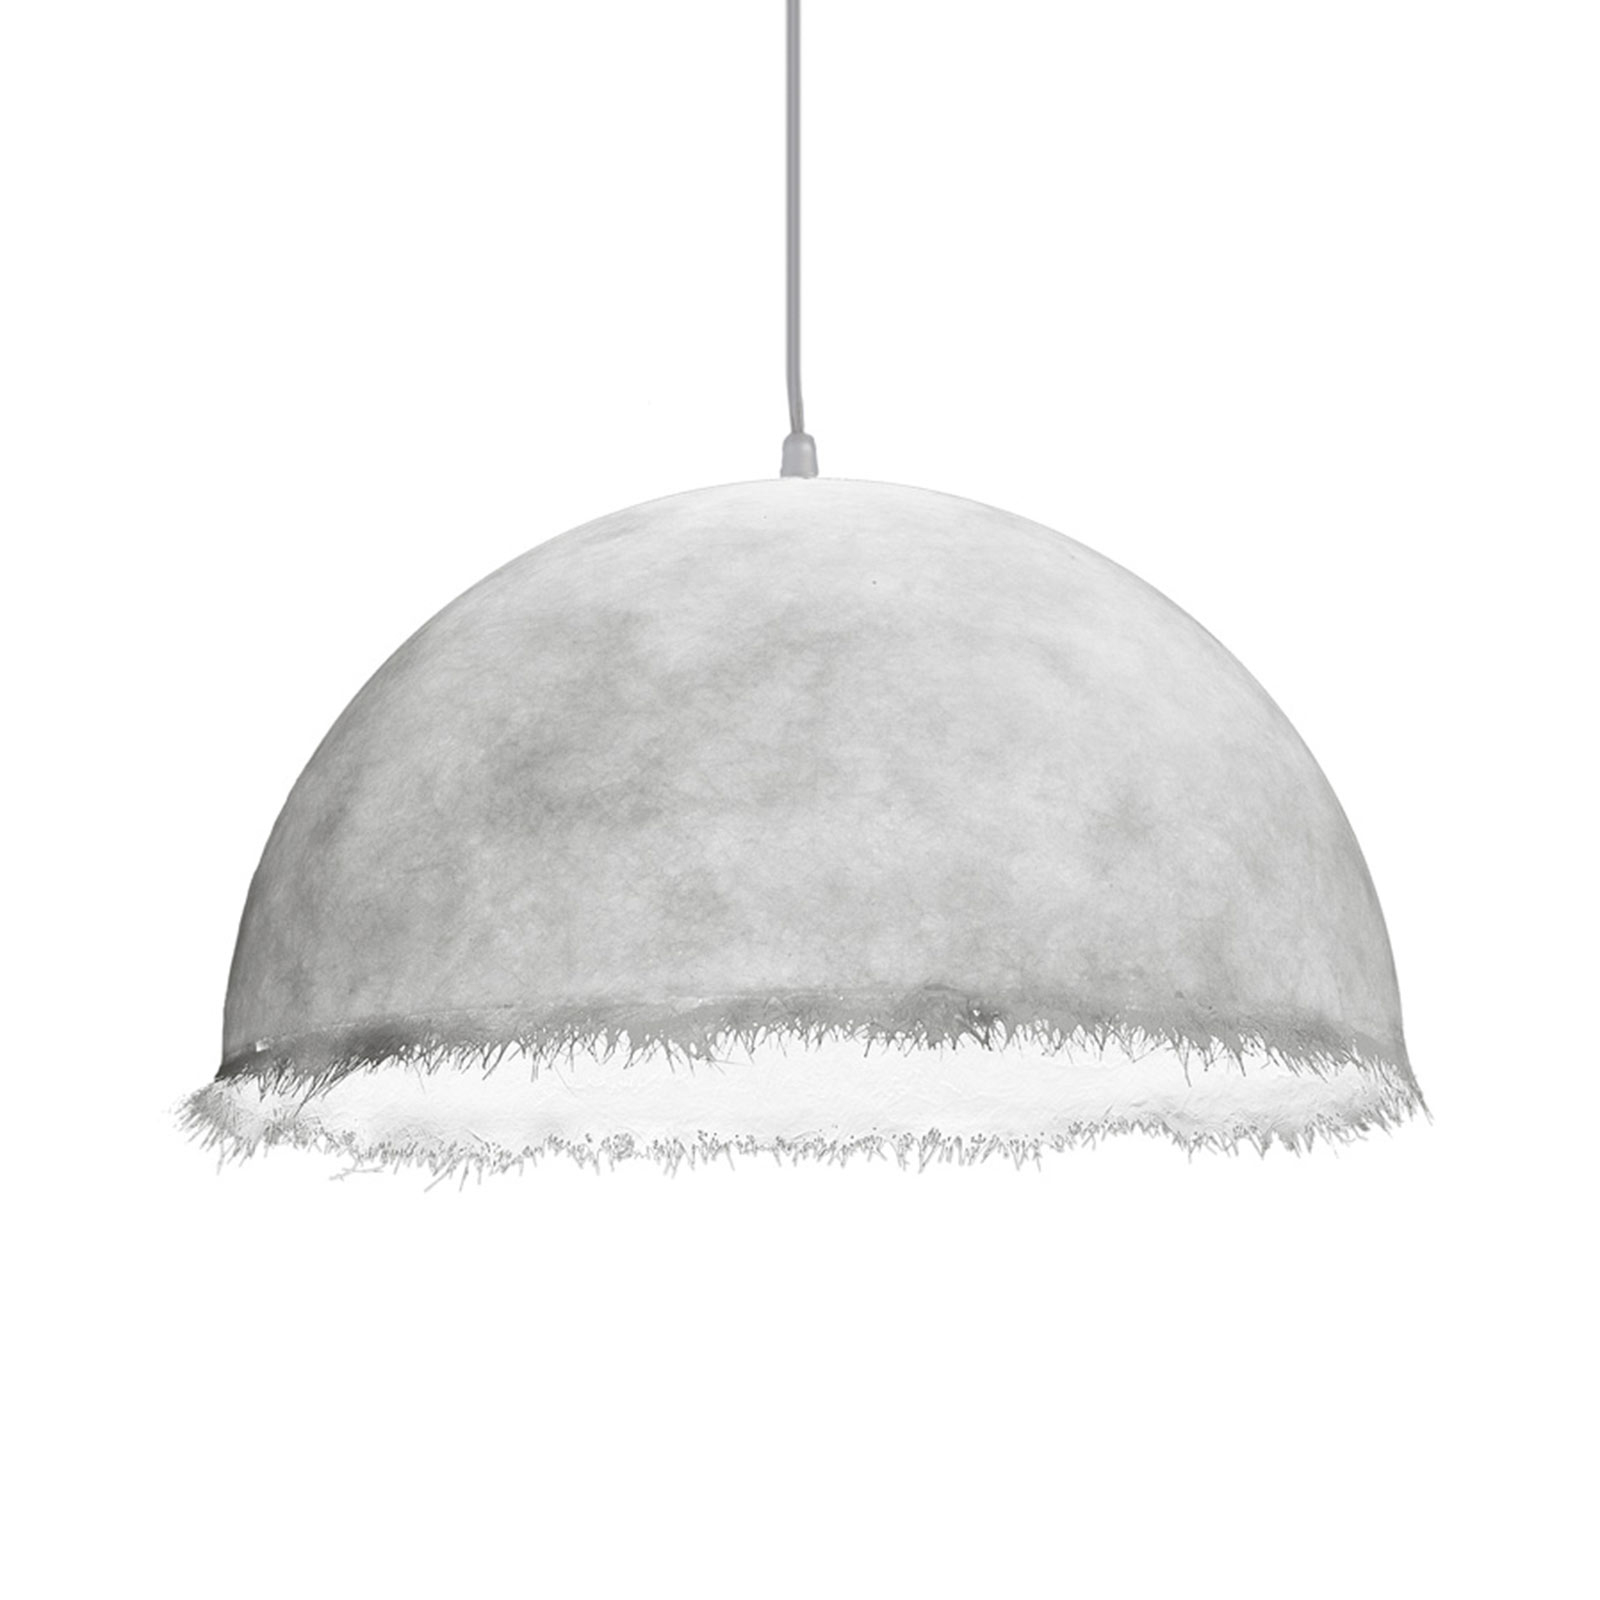 Karman Plancton - LED buiten hanglamp, Ø 45 cm